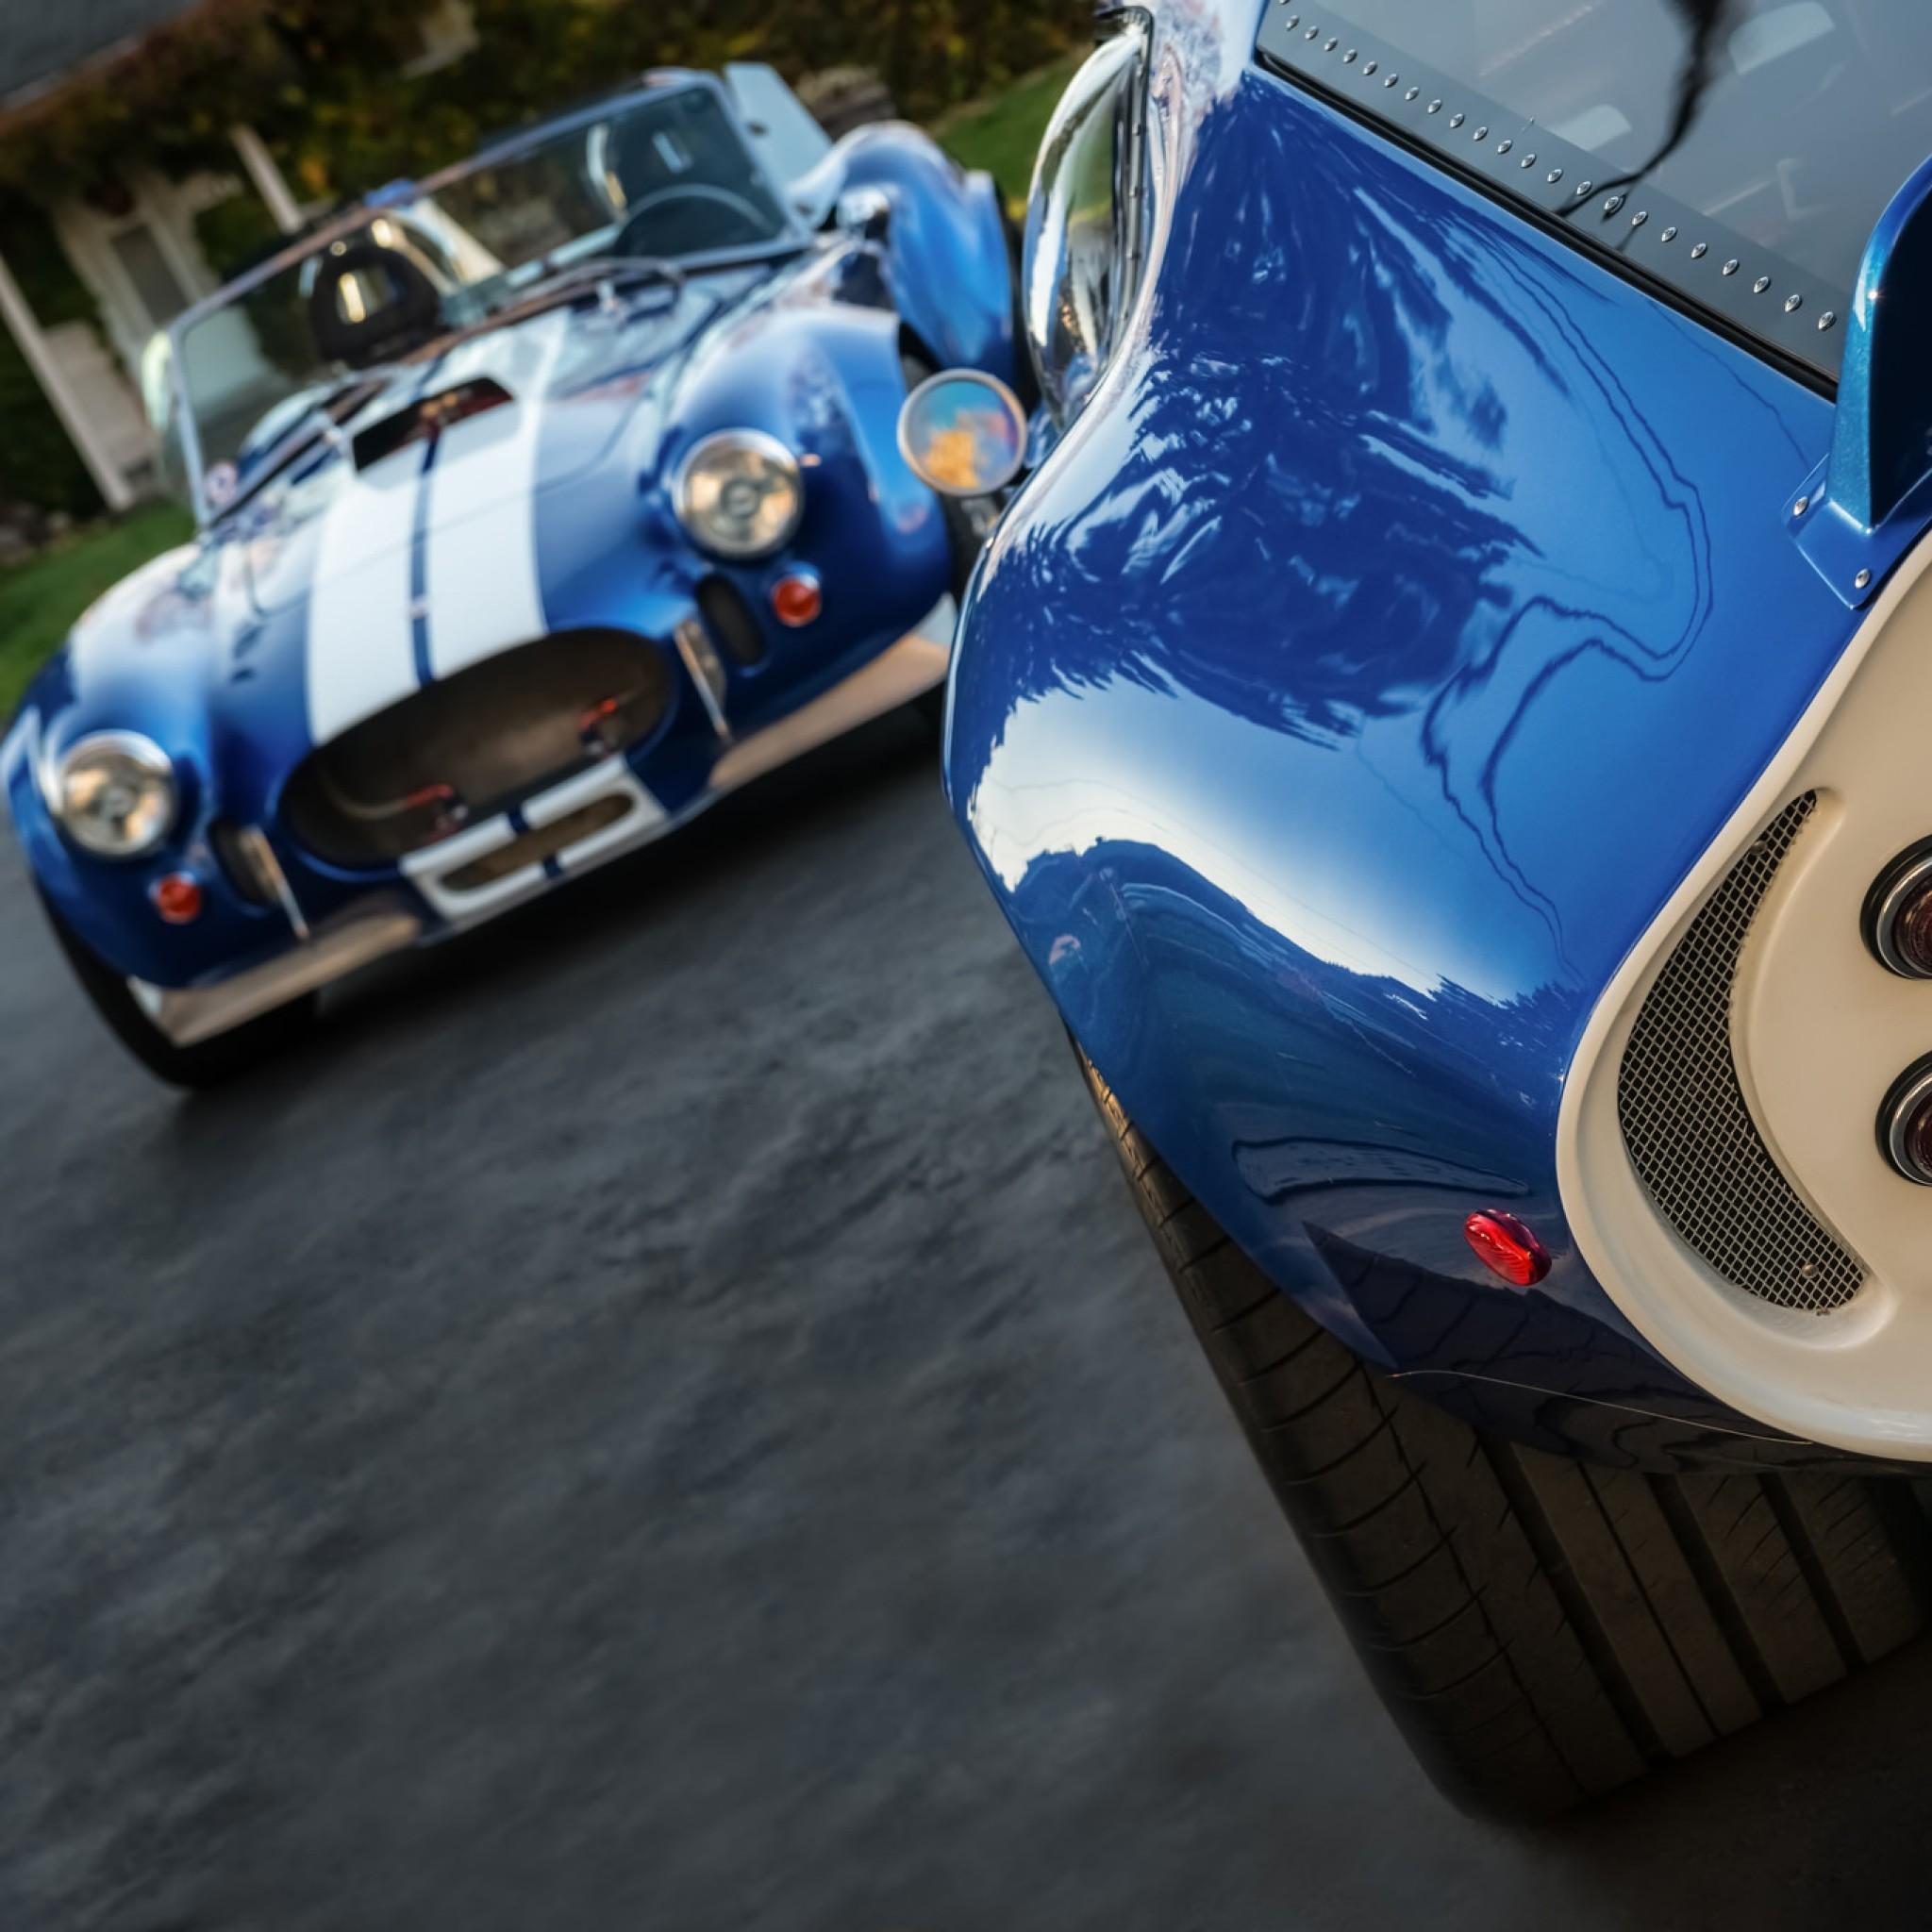 Wallpaper shelby cobra, daytona coupe, 1965, 1967, classic,  racing cars